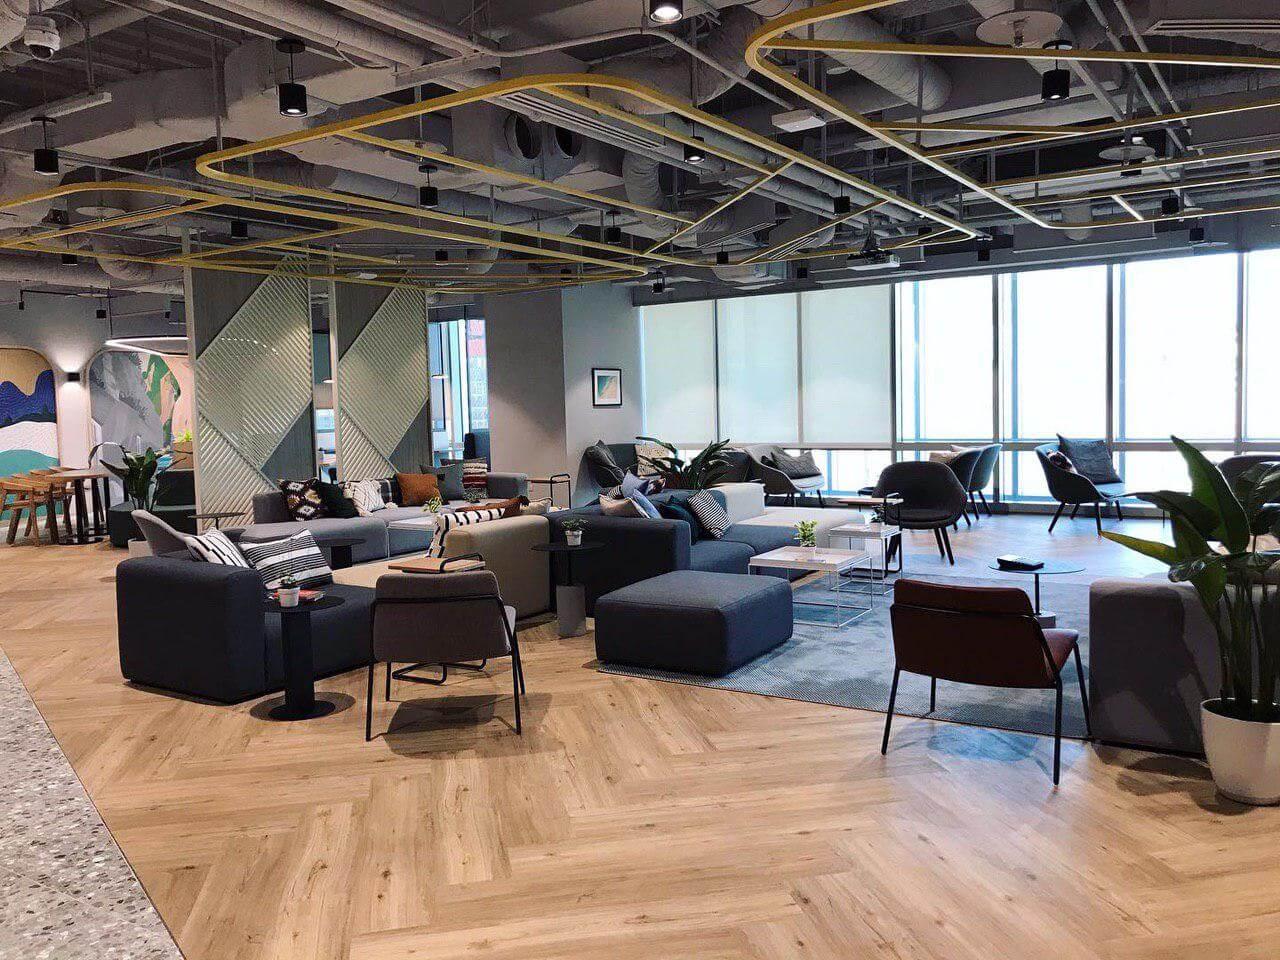 justco 國泰民生大樓 共用空間 Cloud ace 辦公室